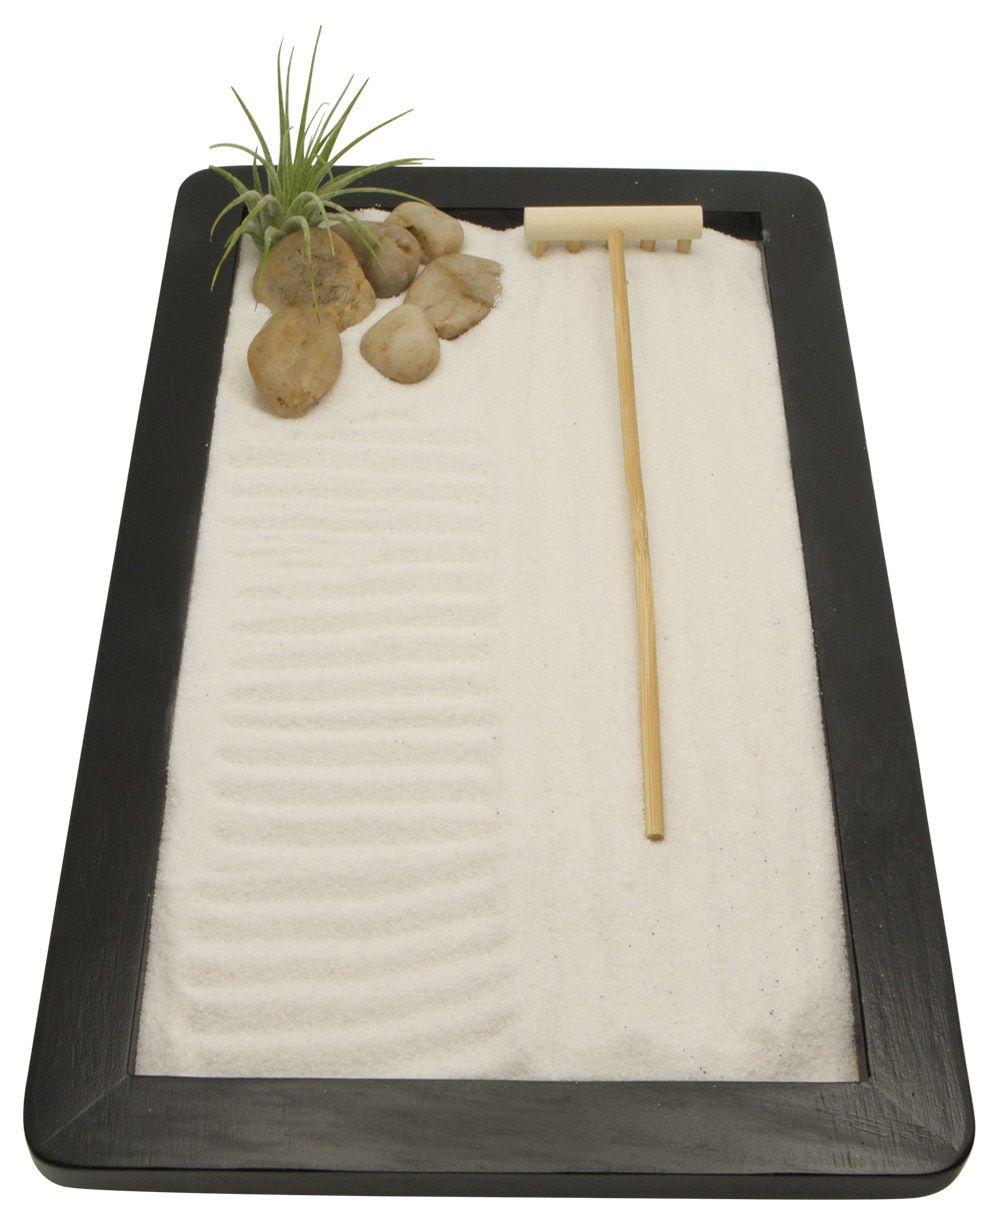 Meditation Zen Garden Complete With White Sand, Smooth Rocks And An  Airplant. Zen Gardens